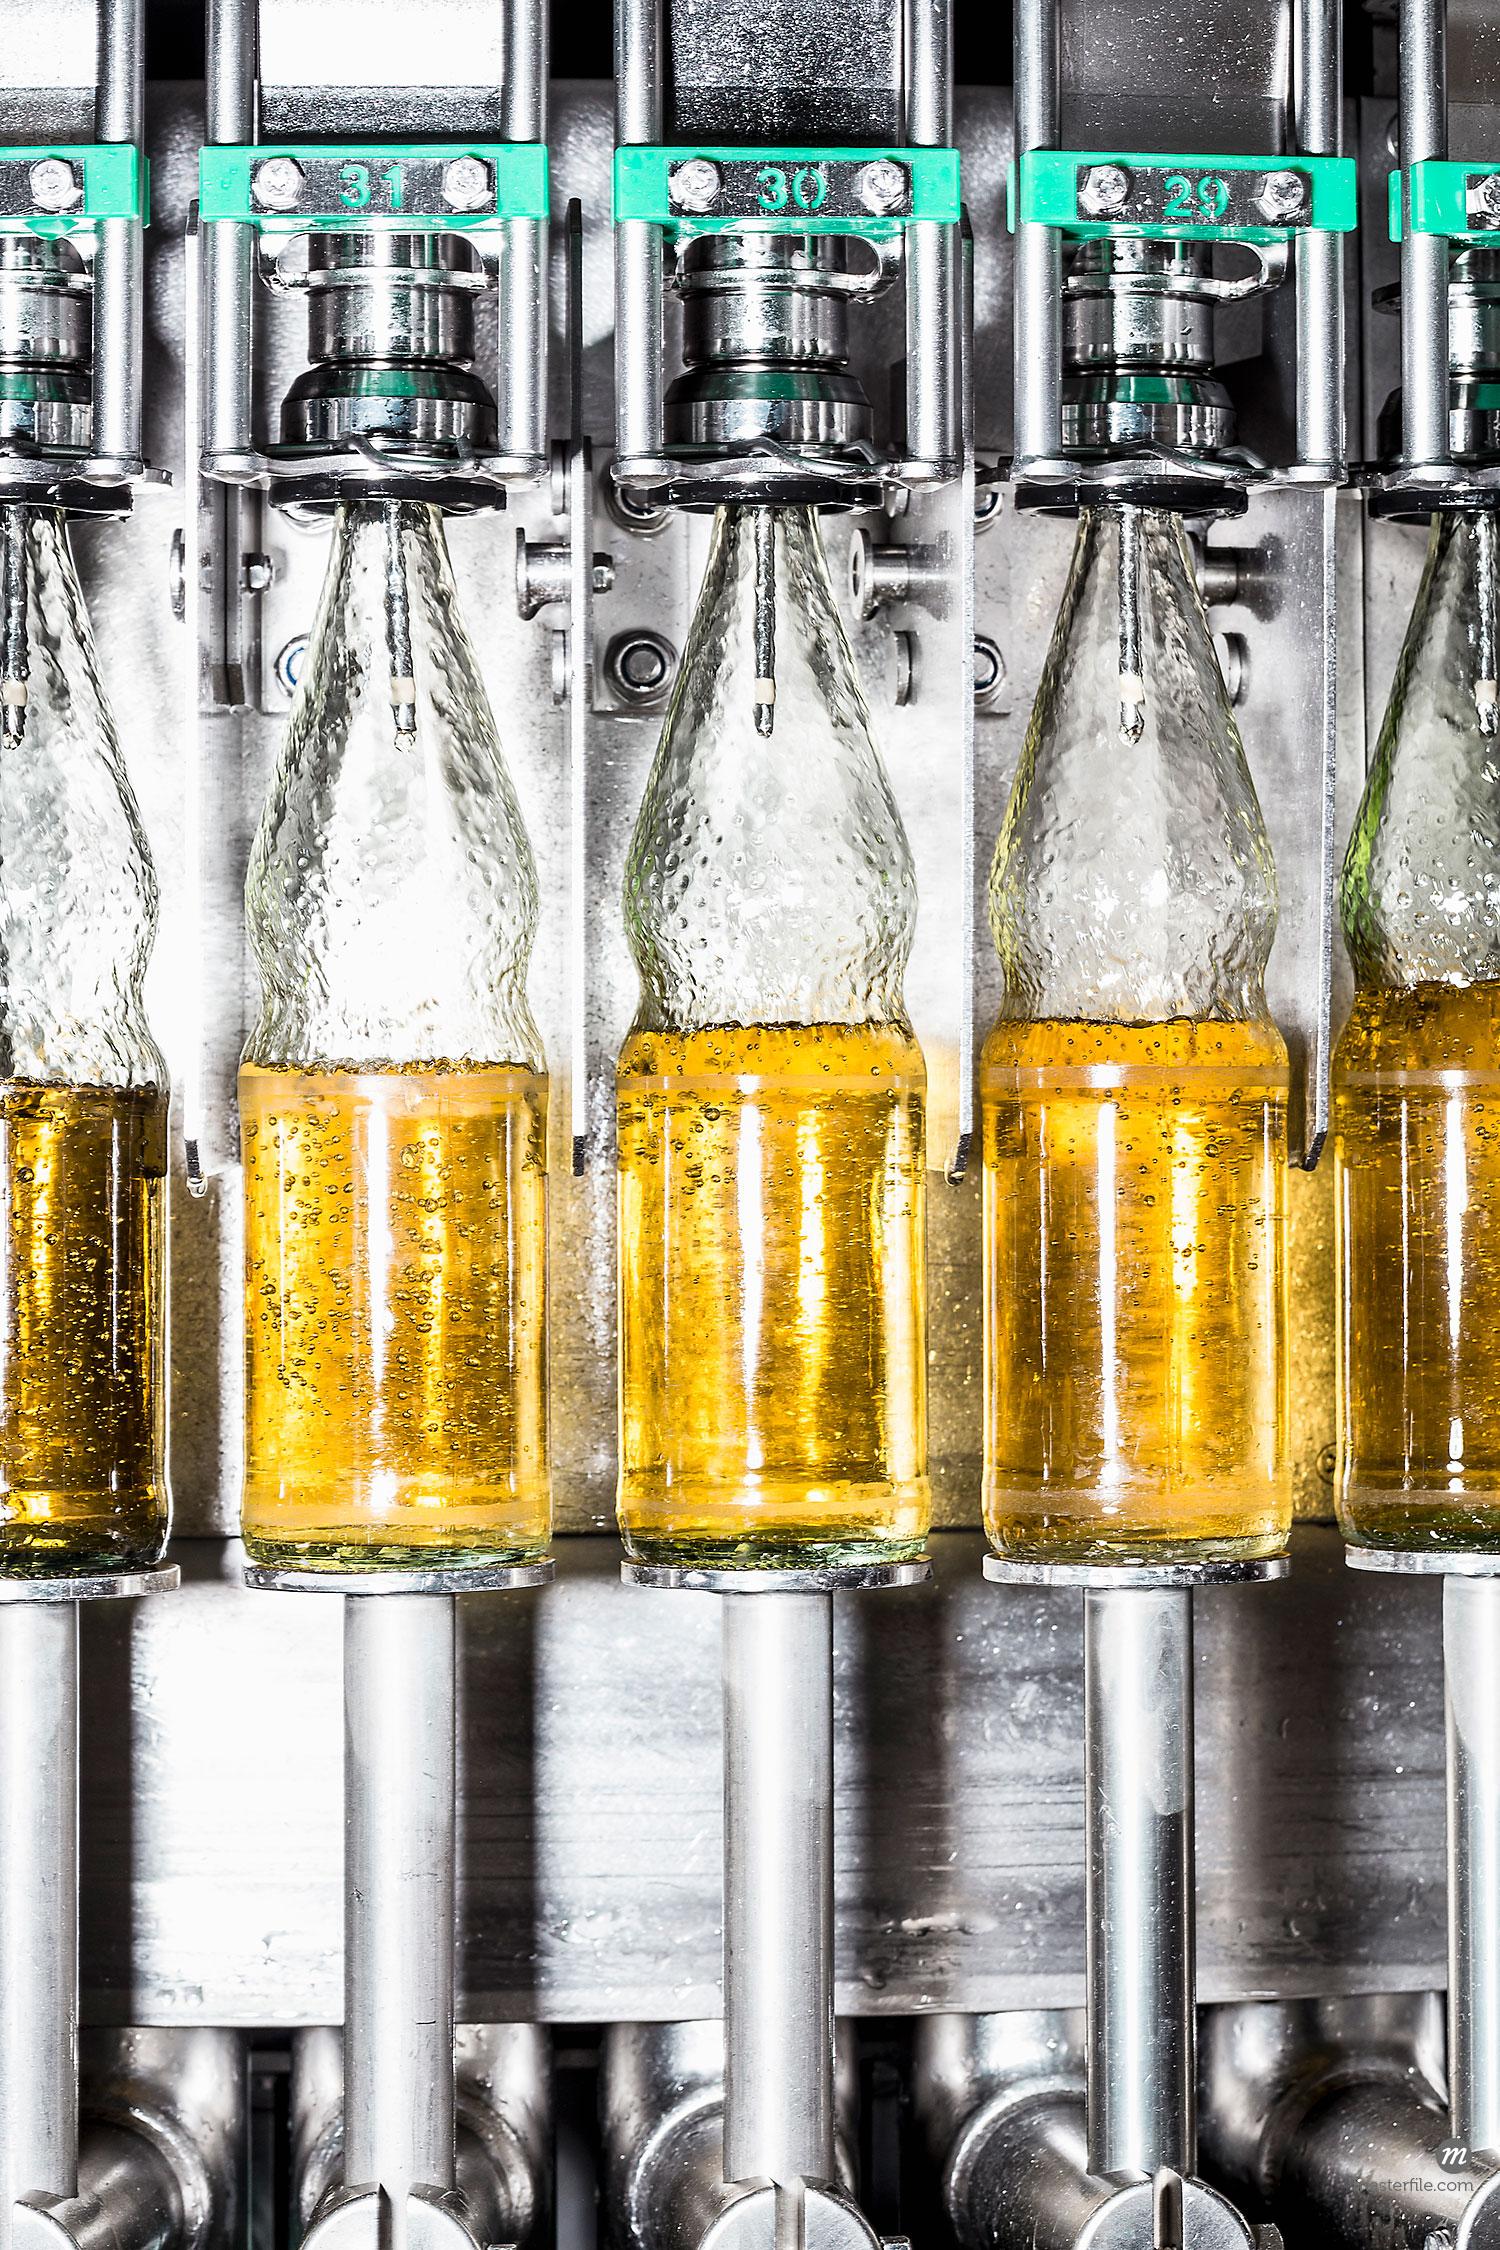 Close up of bottles on conveyor belt  © Masterfile